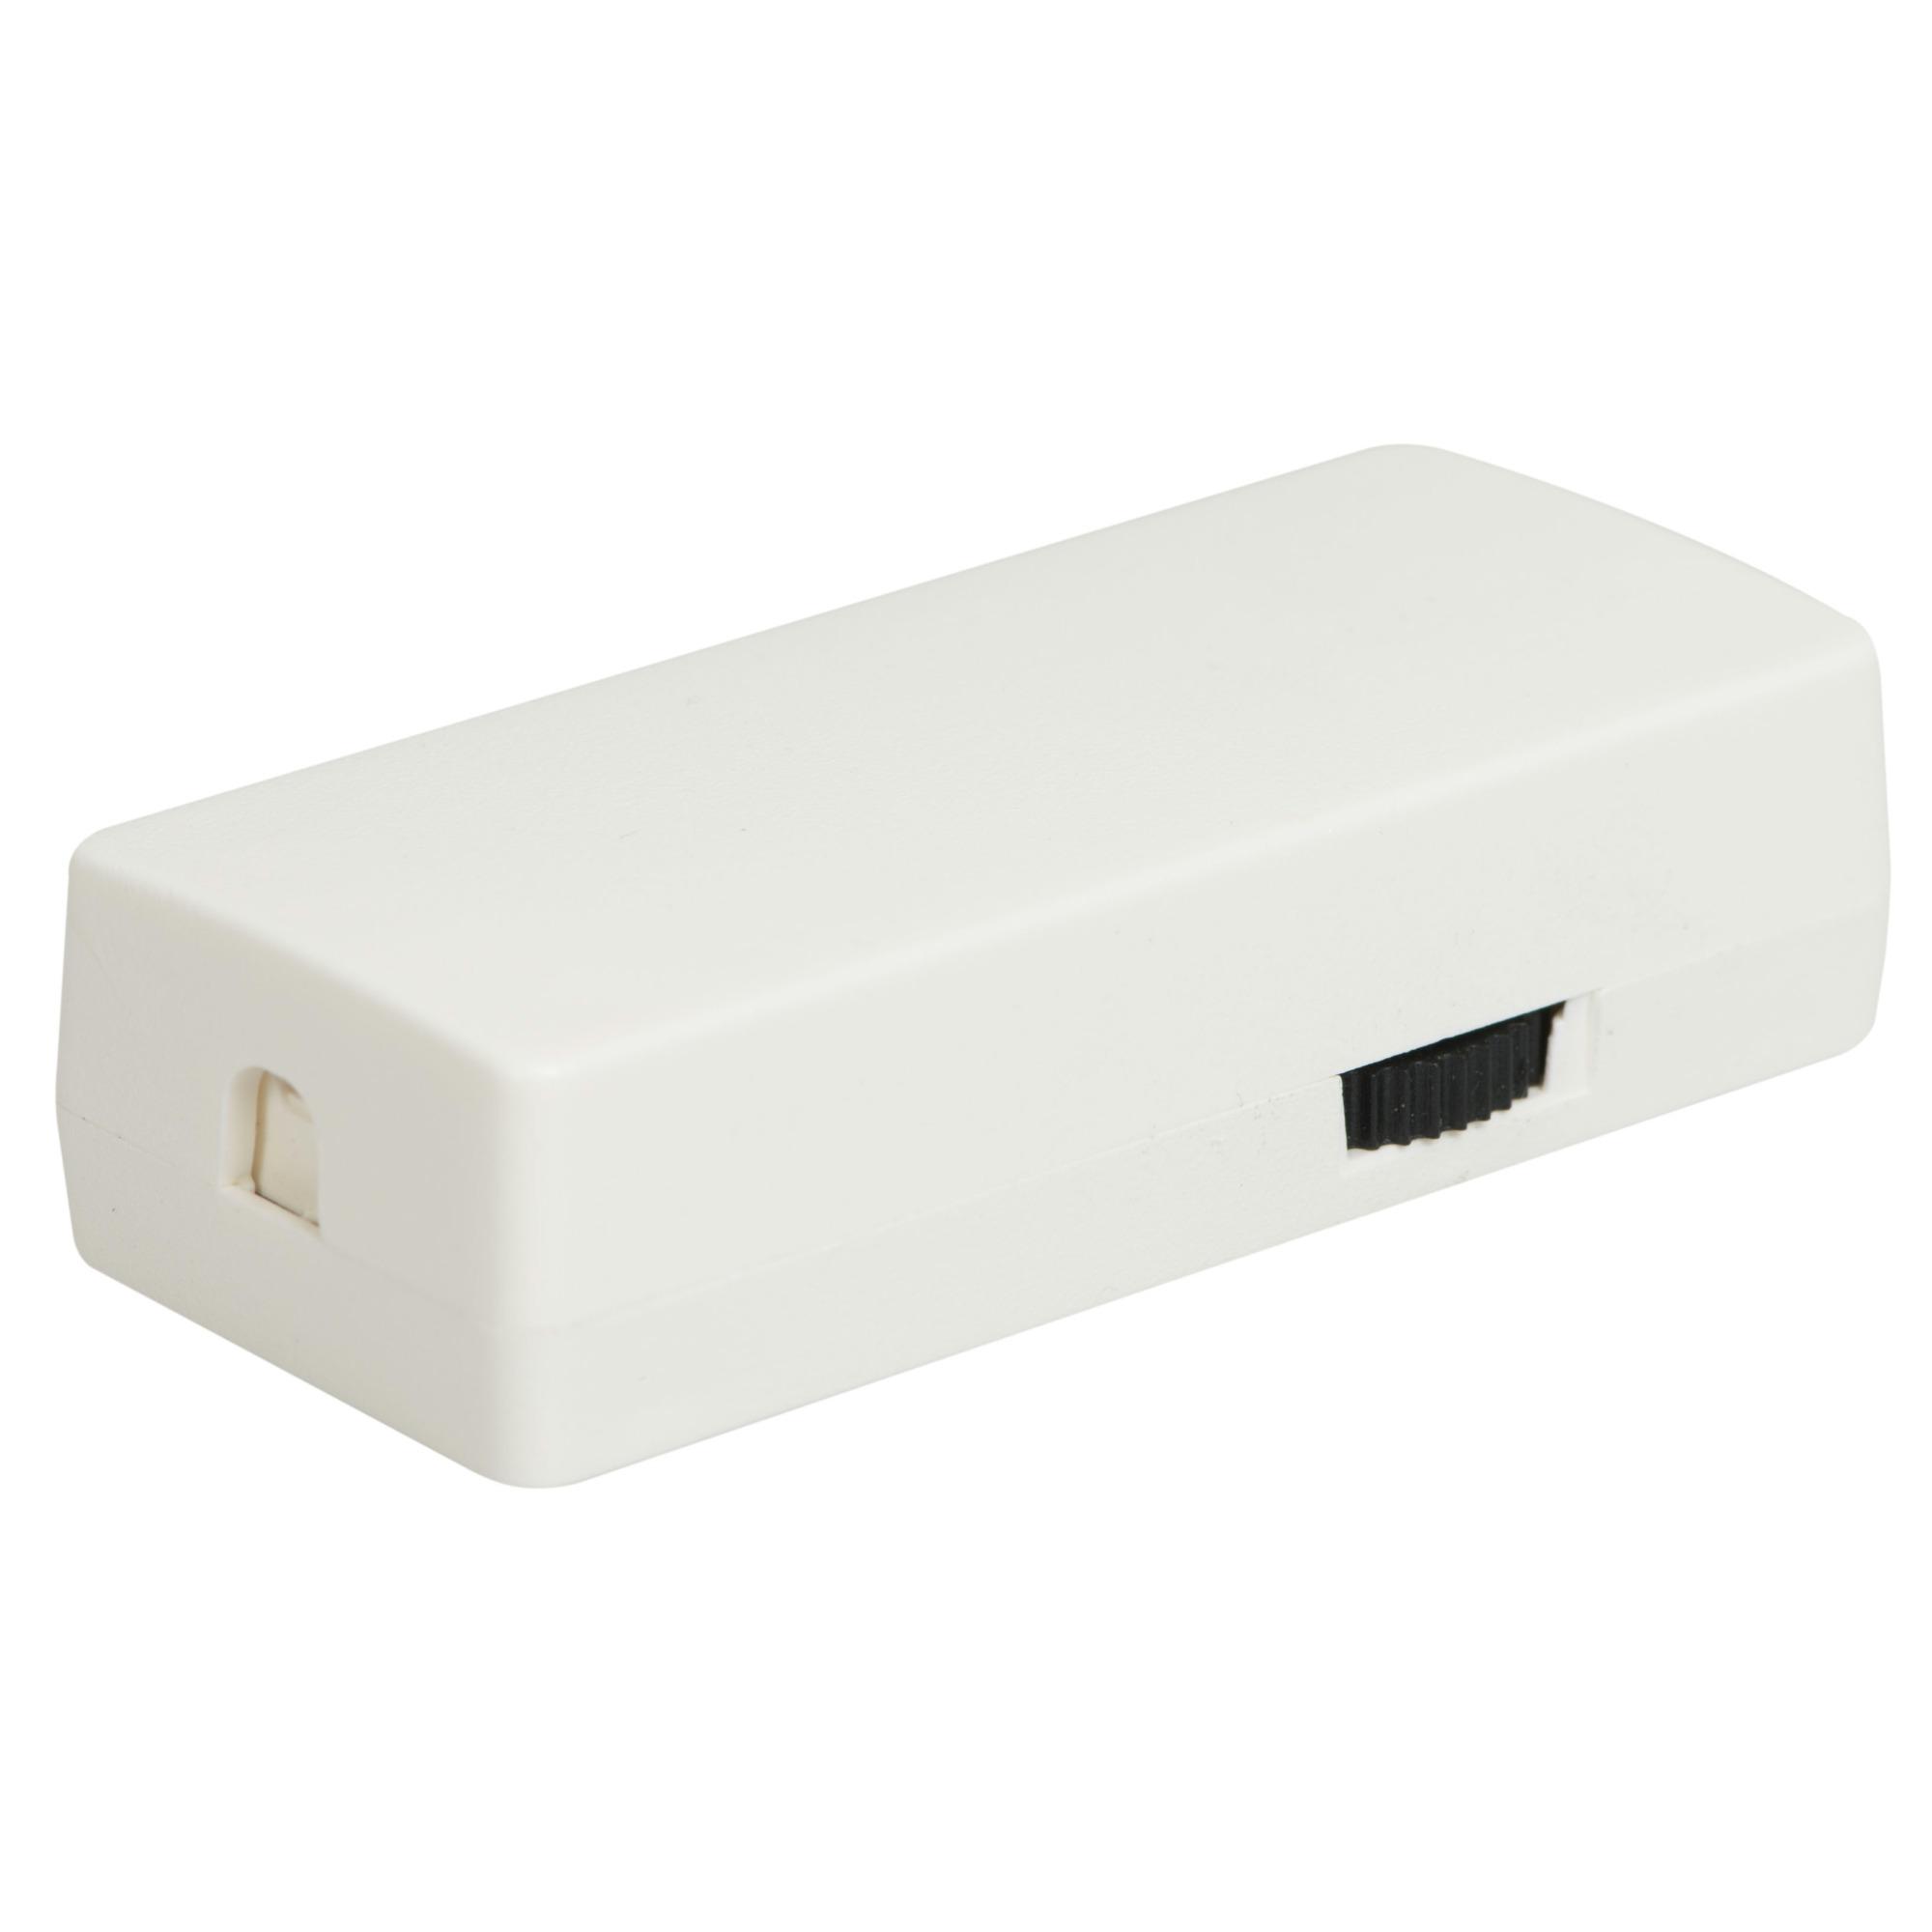 GAMMA LED snoerdimmer 1-25 watt wit